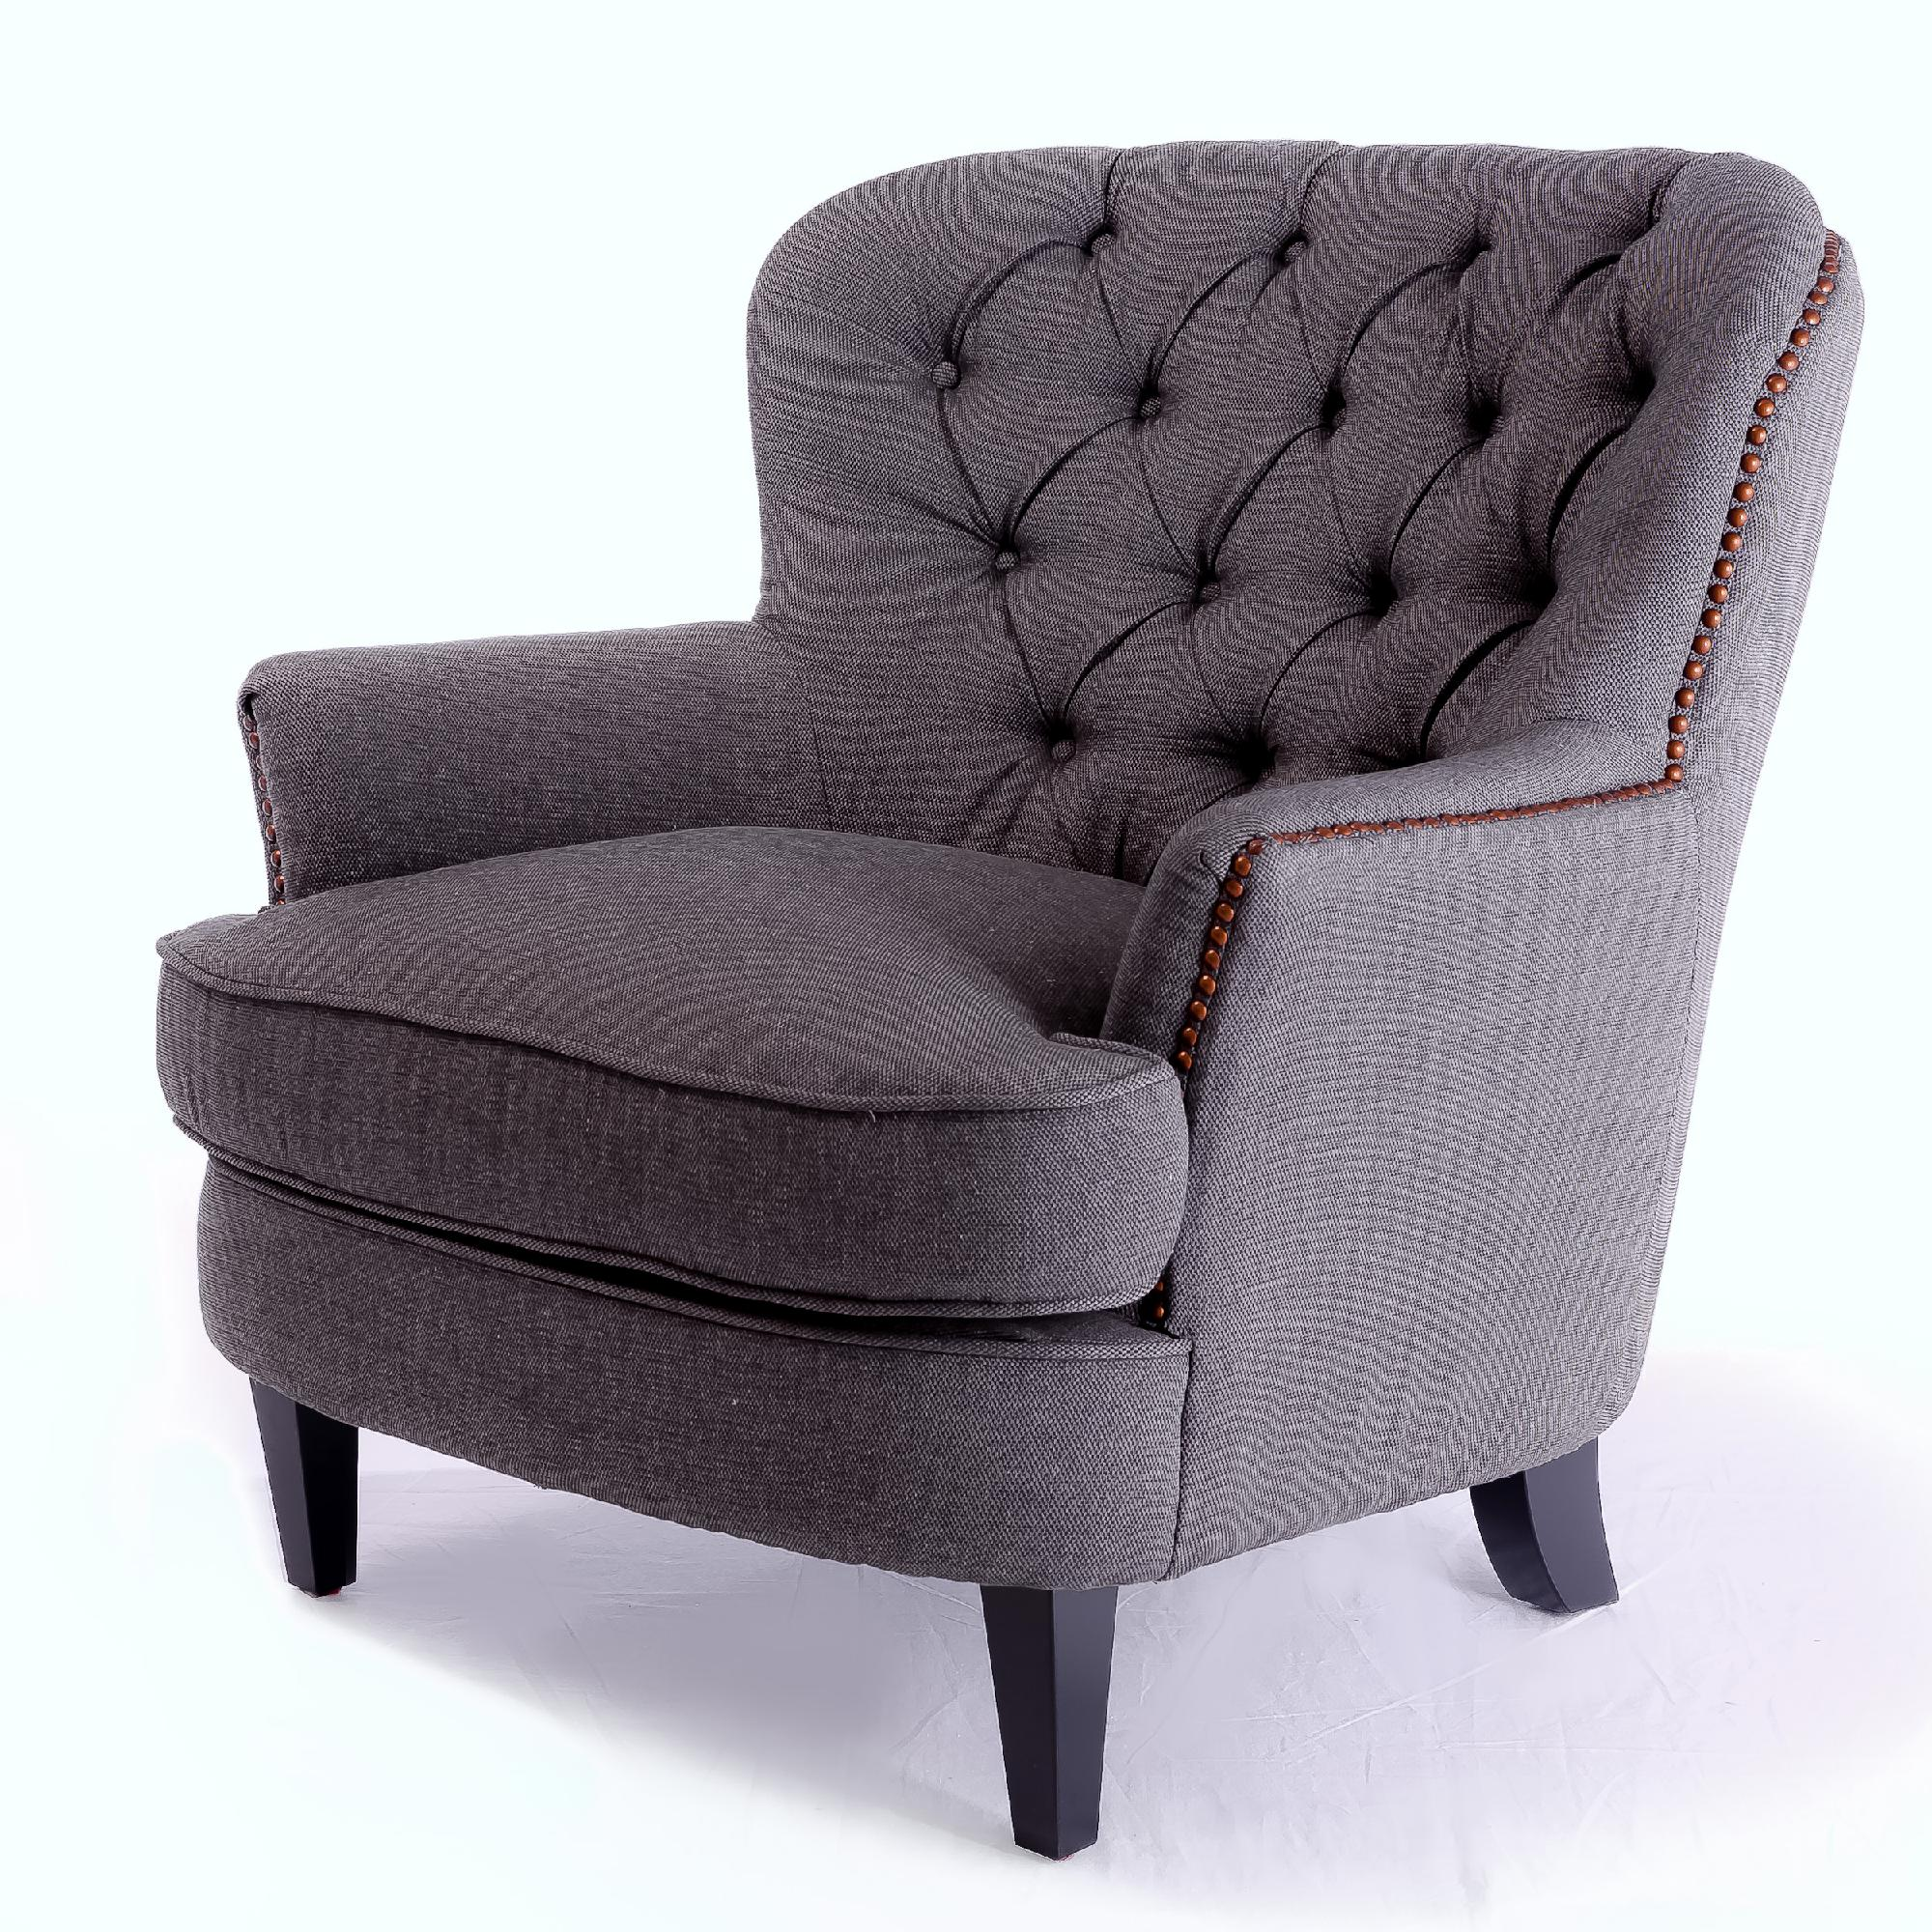 tafton club chair cheap ivory covers gray fabric